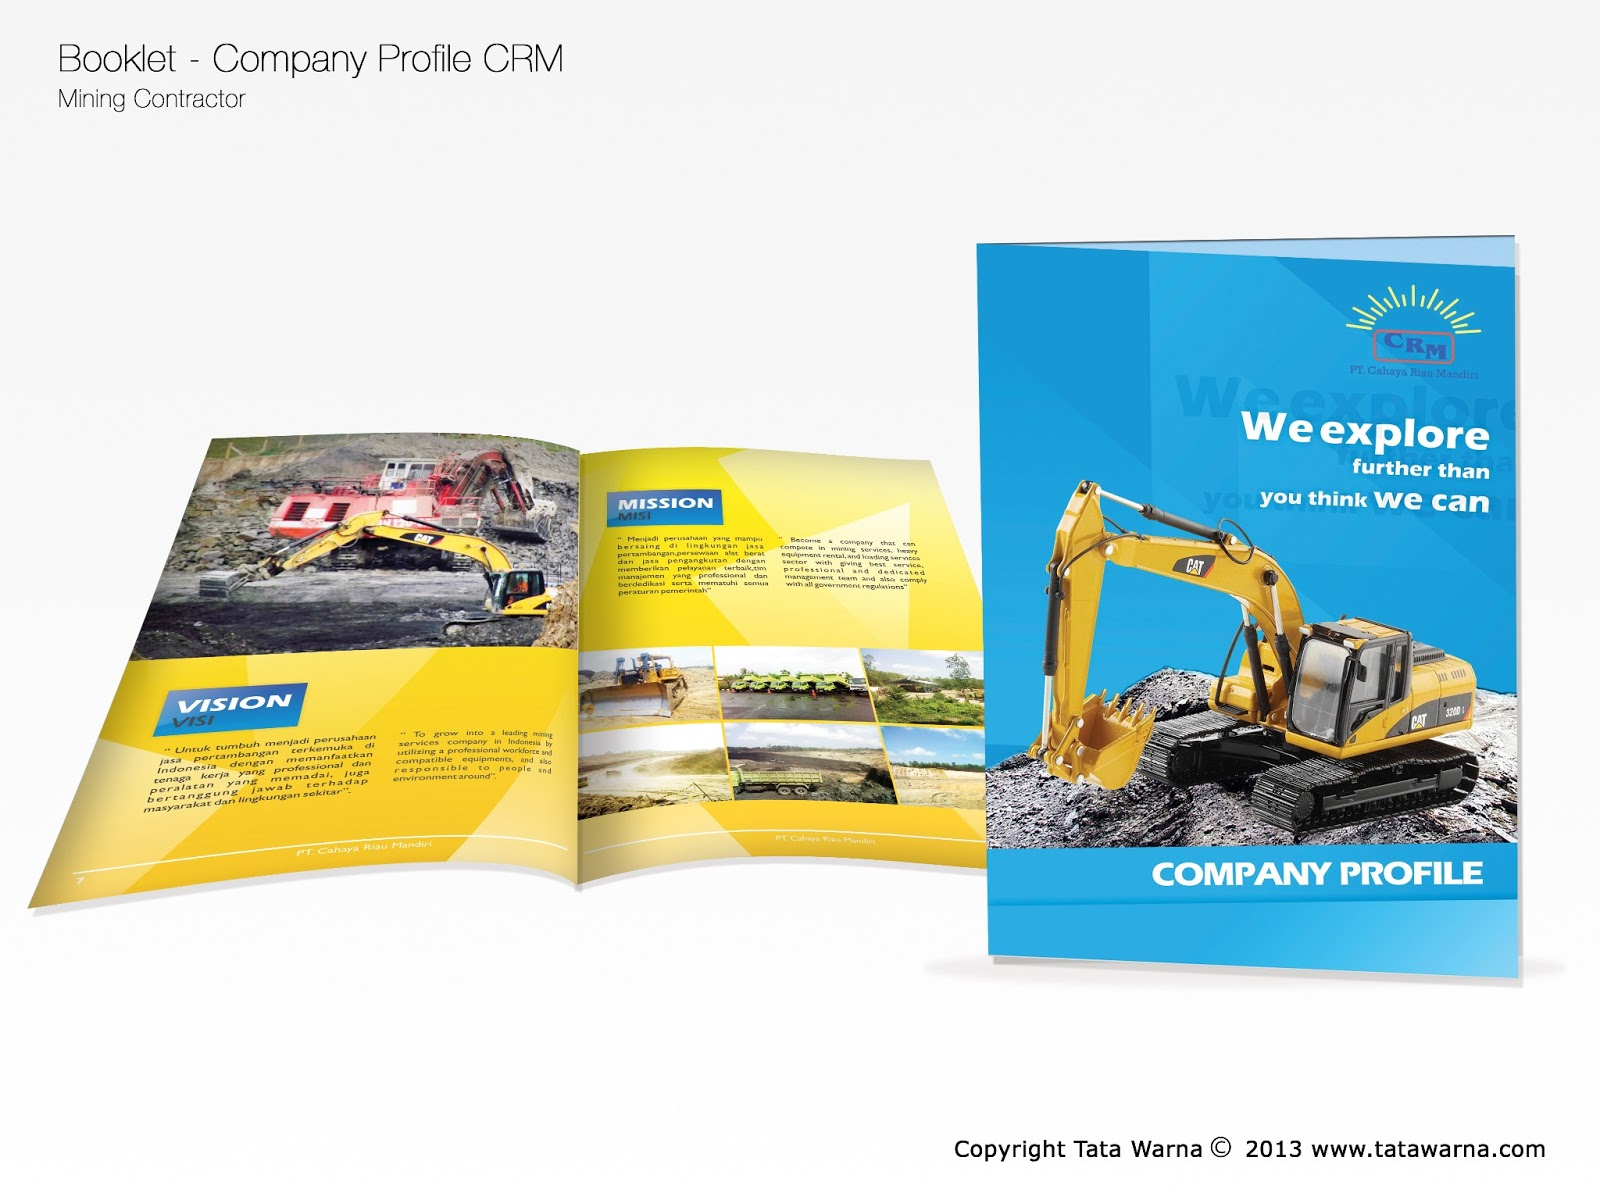 by Tata Warna Kamis, 11 April 2013 Labels: desain company profile